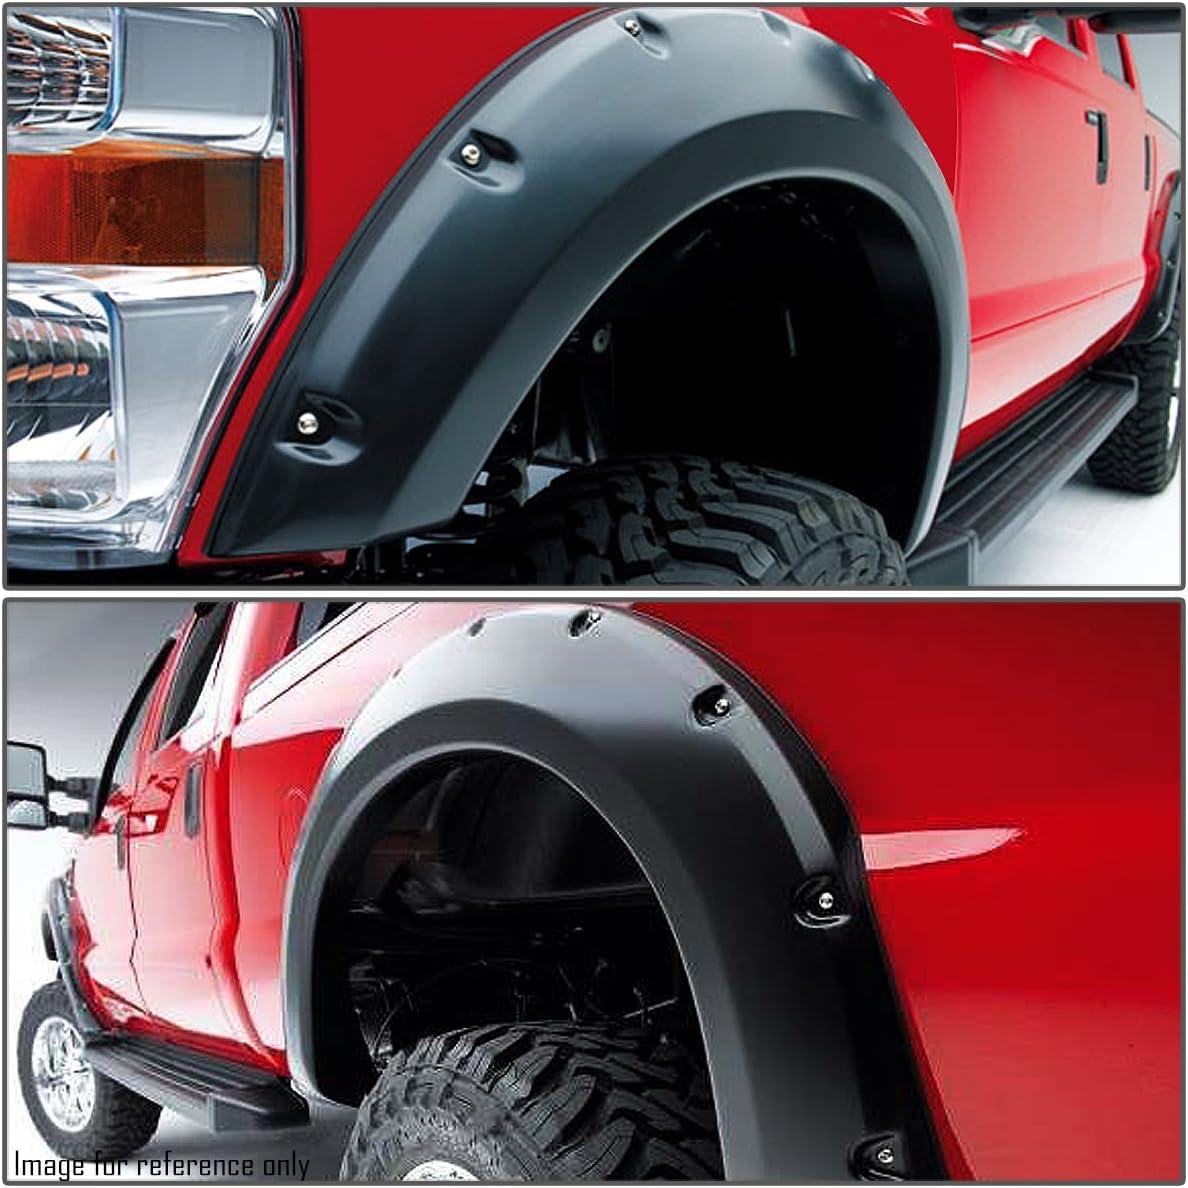 for 07-13 Tundra DNA MOTORING WF-TD07-MBK Bump Textured Pocket-Rivet Fender Wheel Flare Style Side